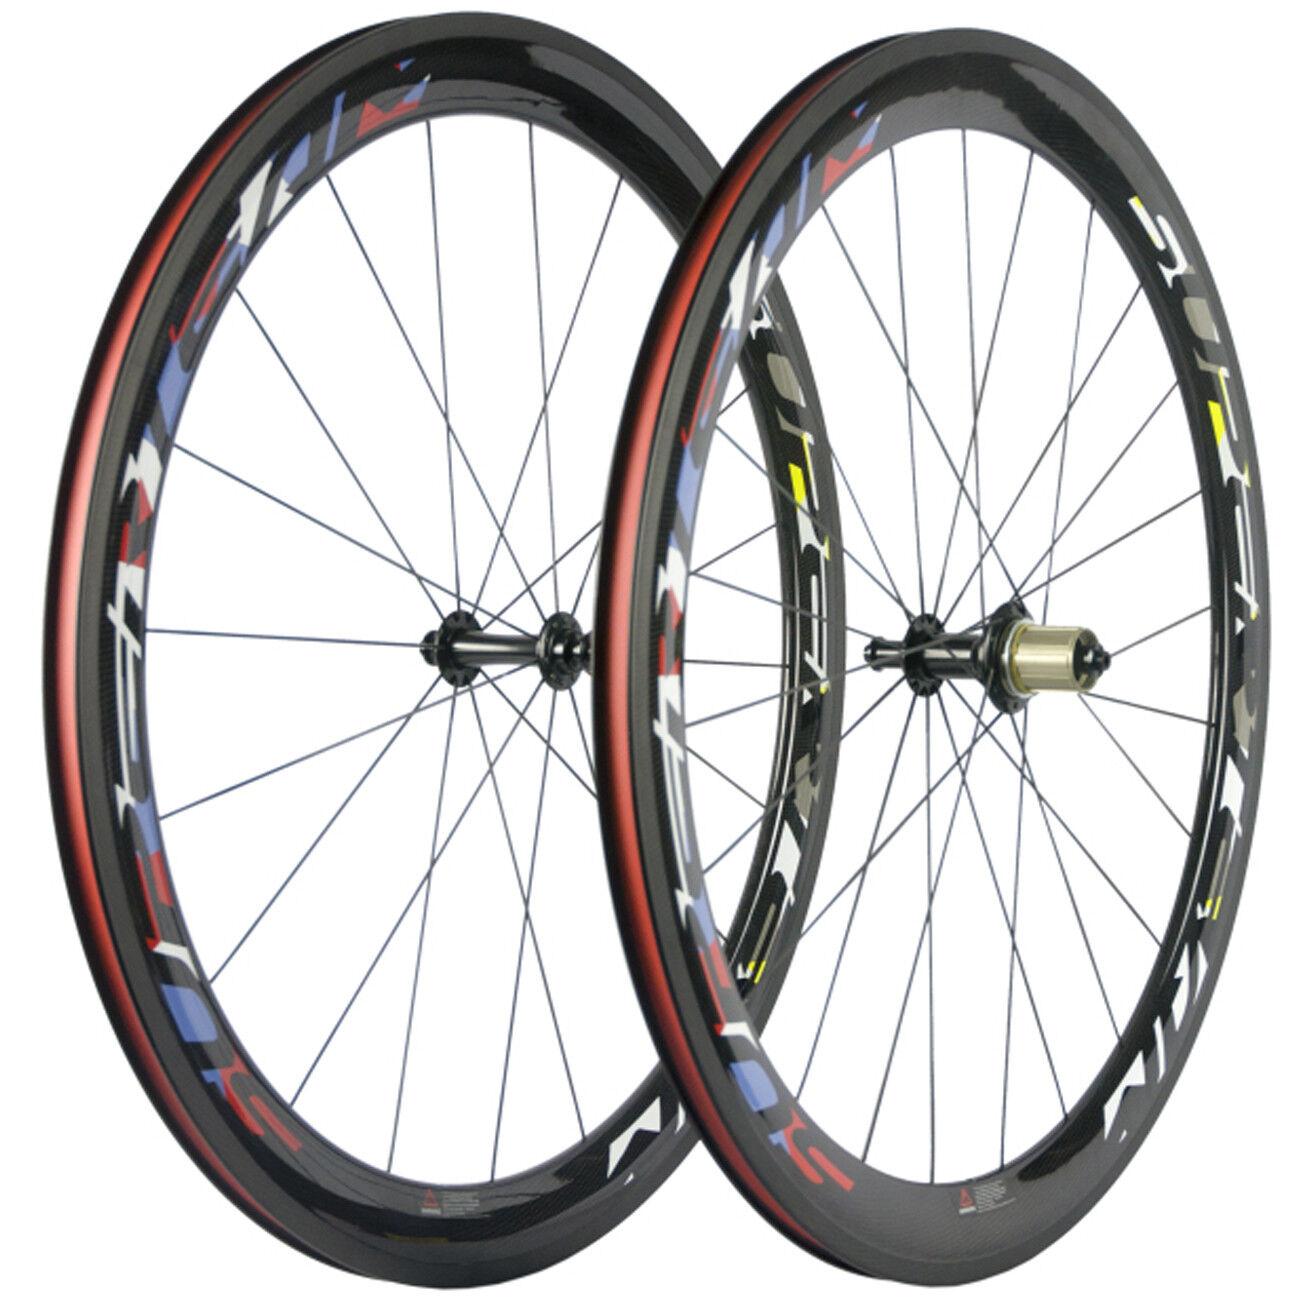 Superteam 700C HubSmith Ceramic Cycling Carbon Wheels 50mm Clincher  Carbon Wheel  online discount